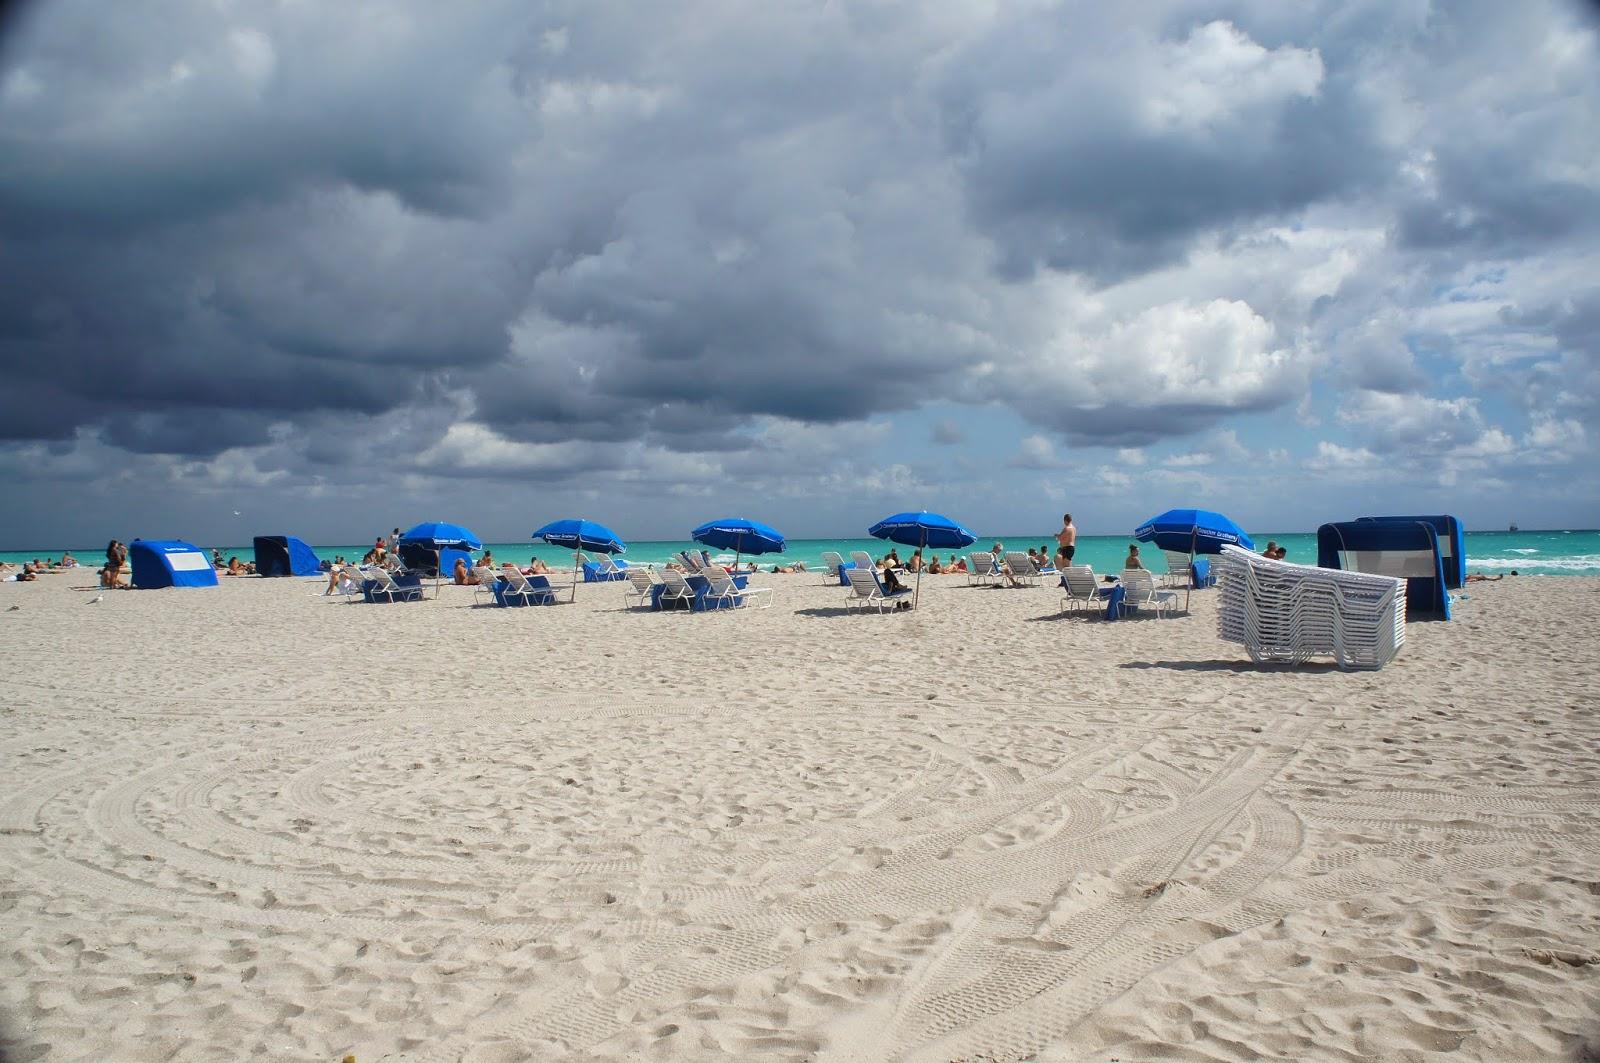 blue umbrellas in the beach